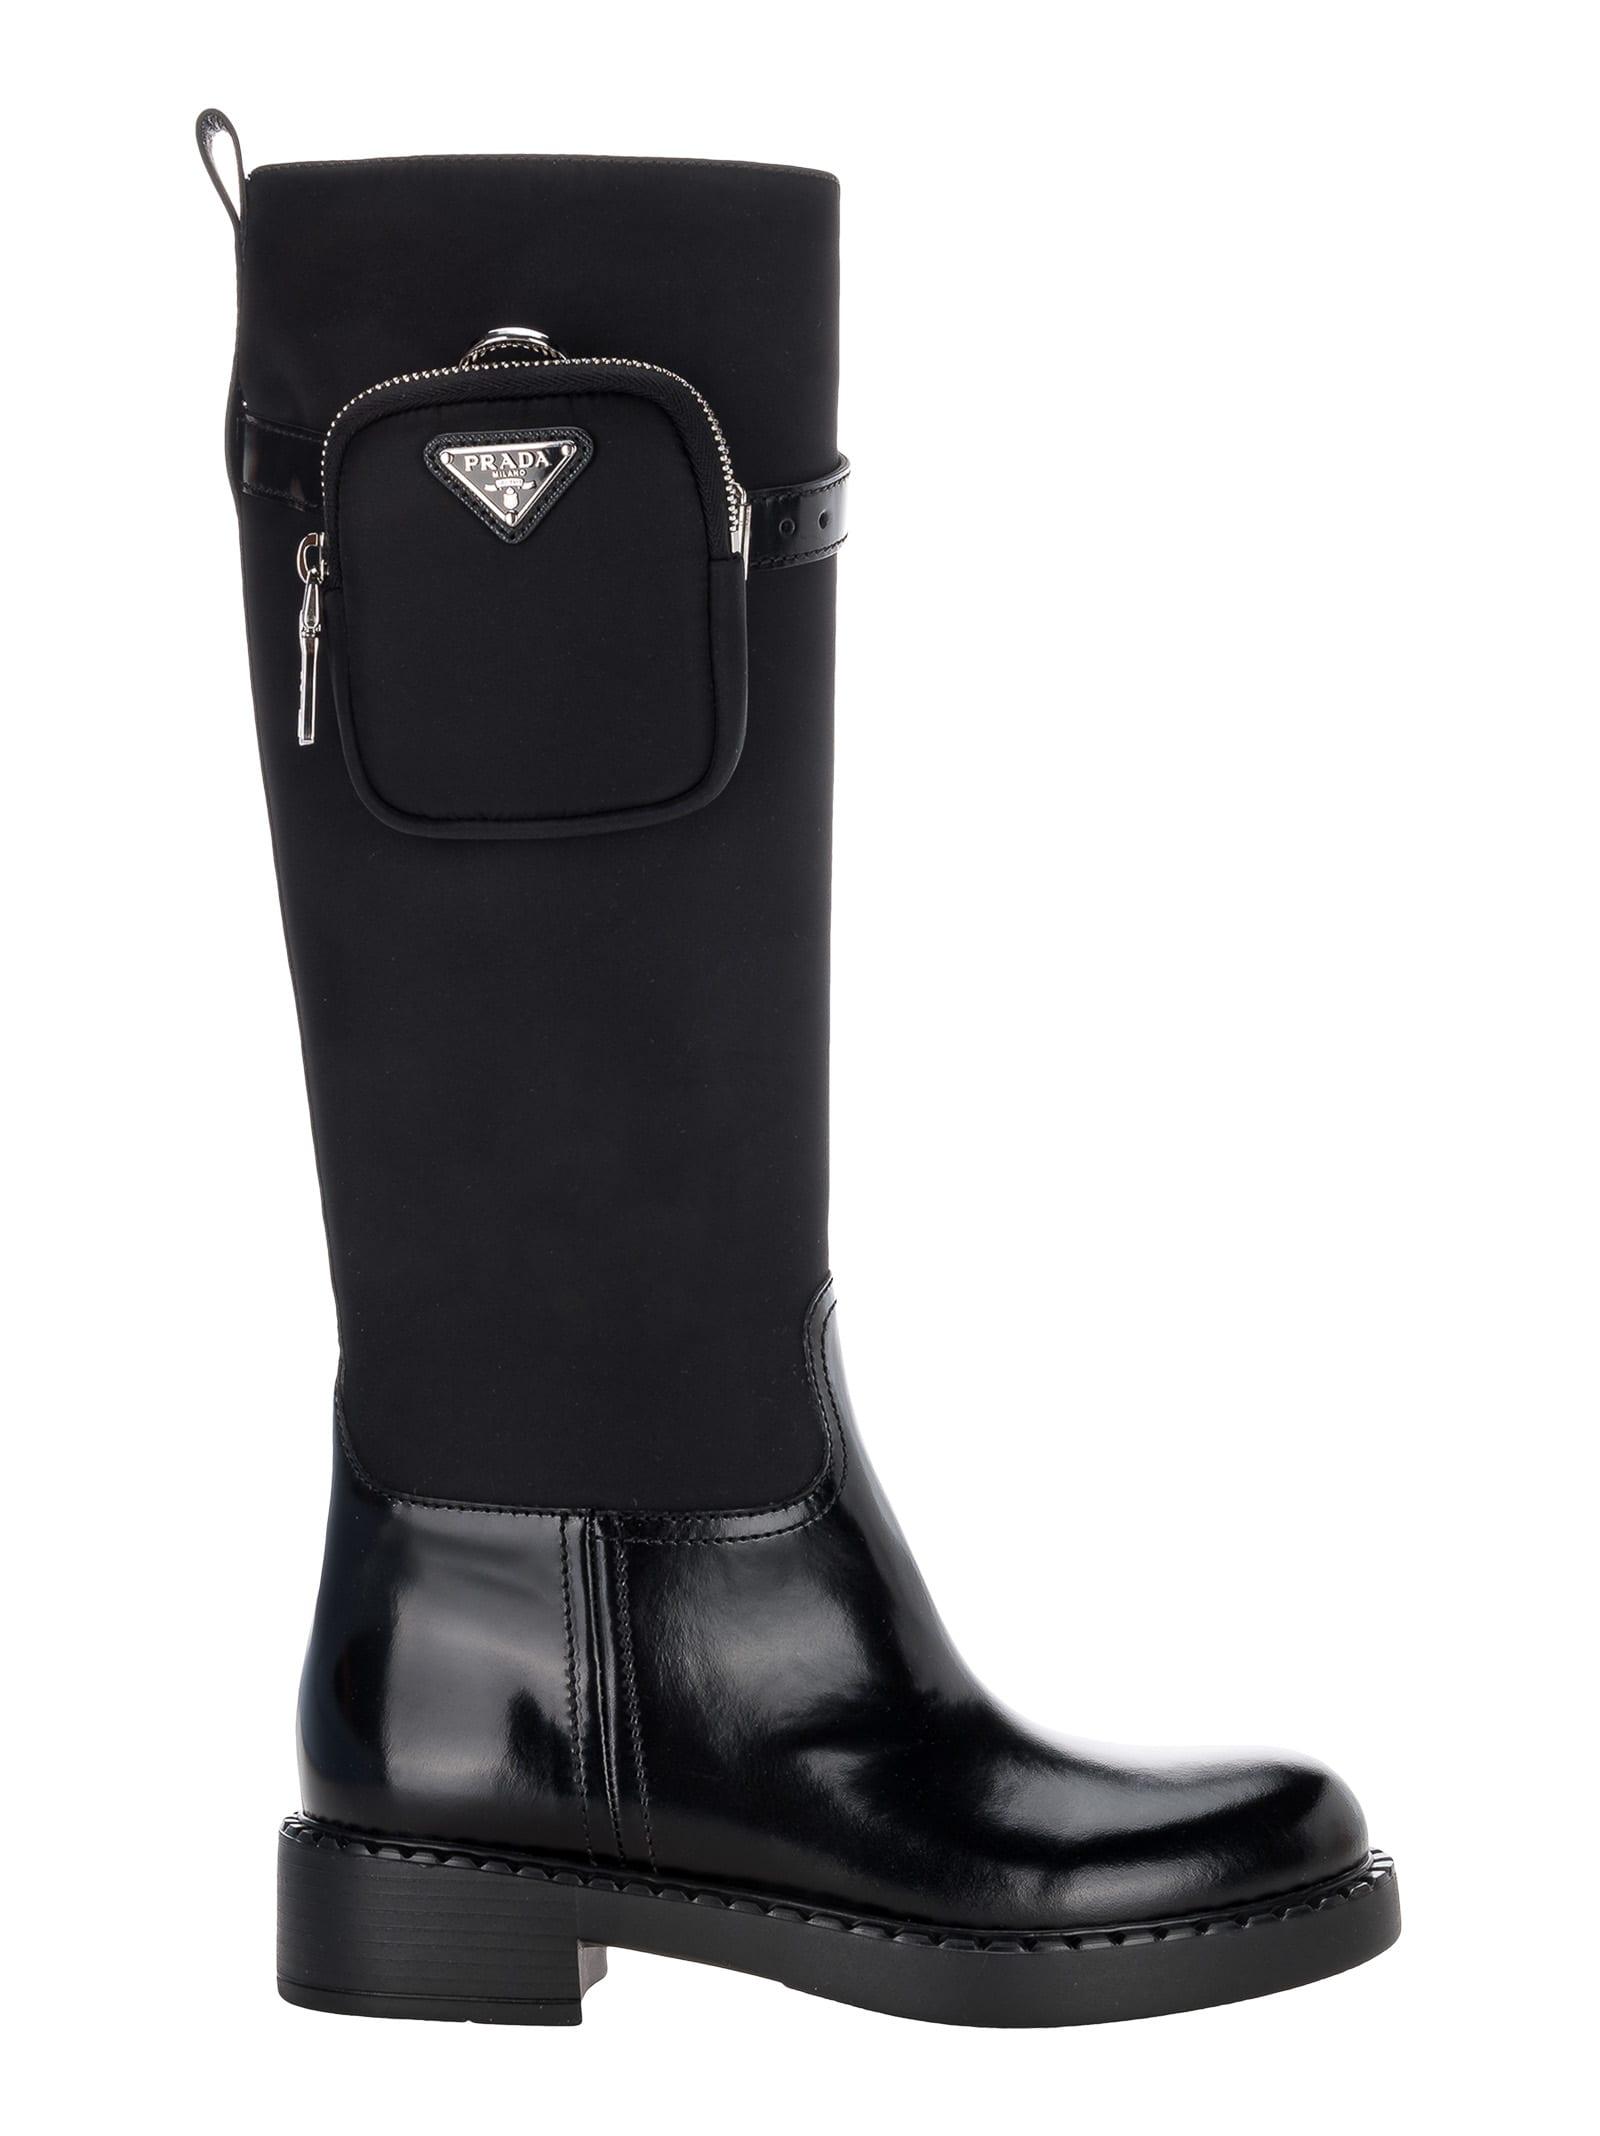 Prada Re-nylon High Boots